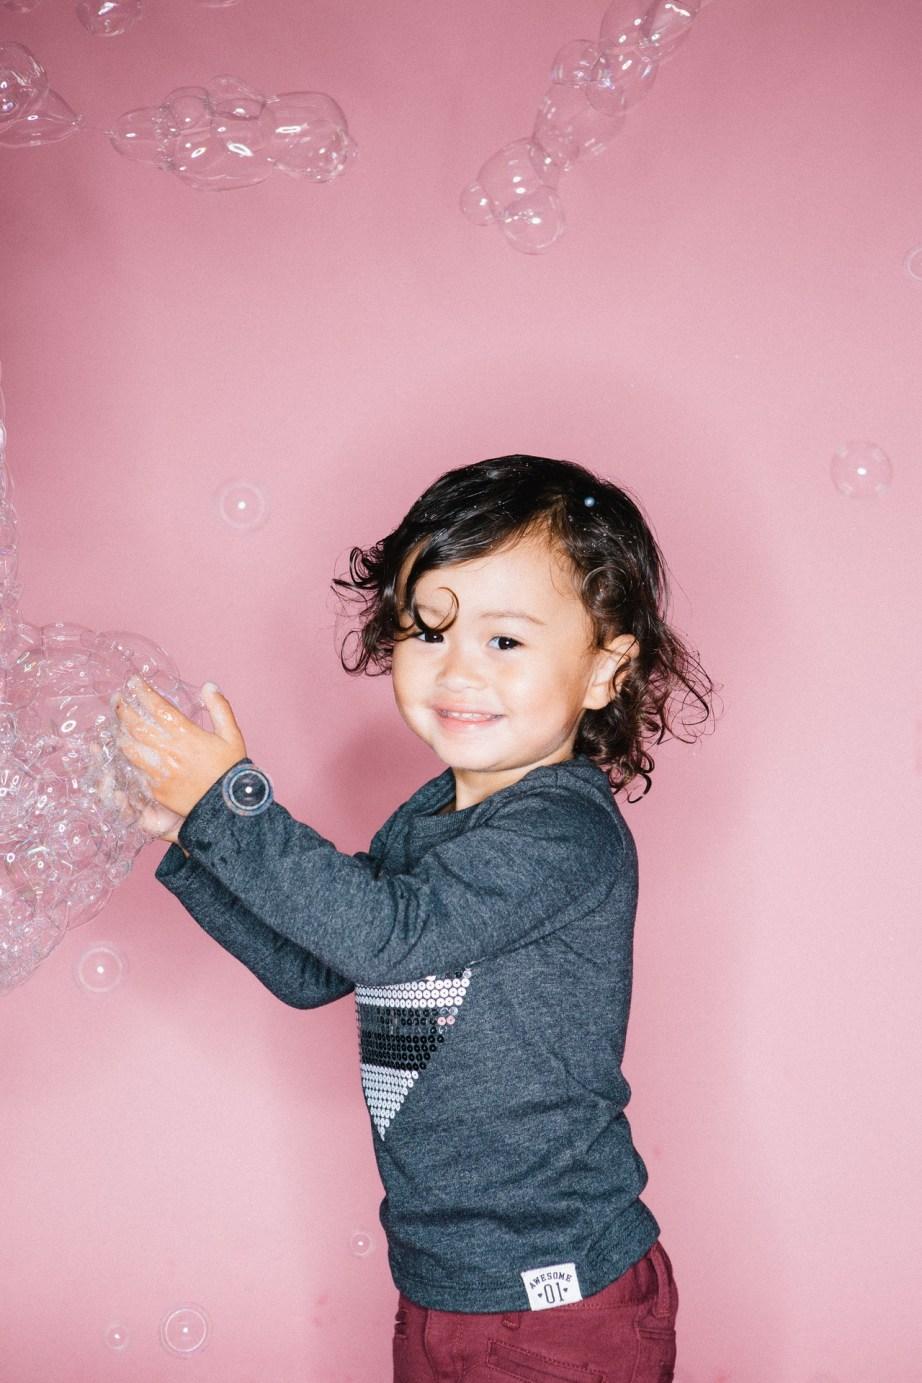 kids in bubbles photography studio nicole caldwell 04